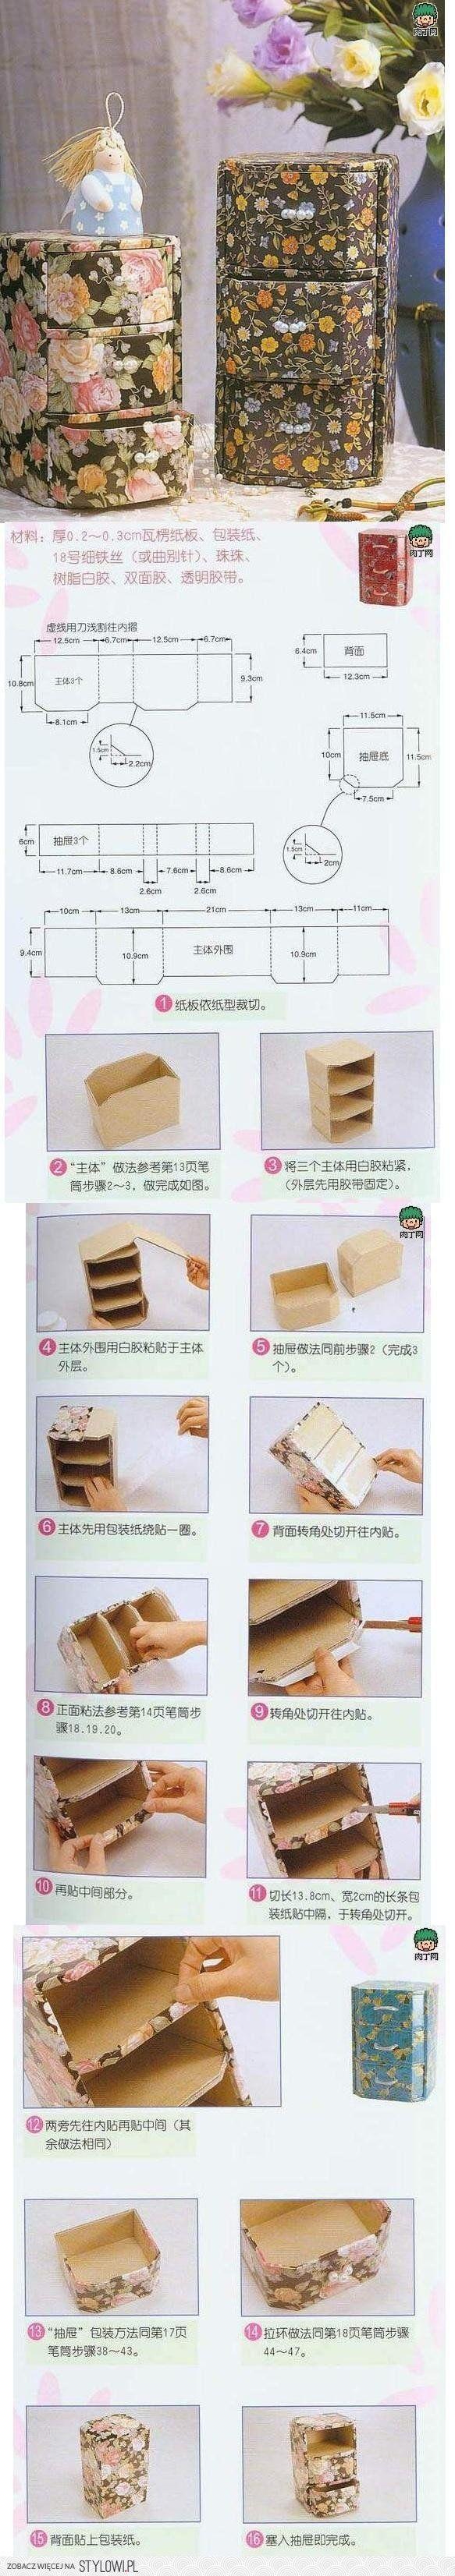 Fabric covered box - Cartonnage